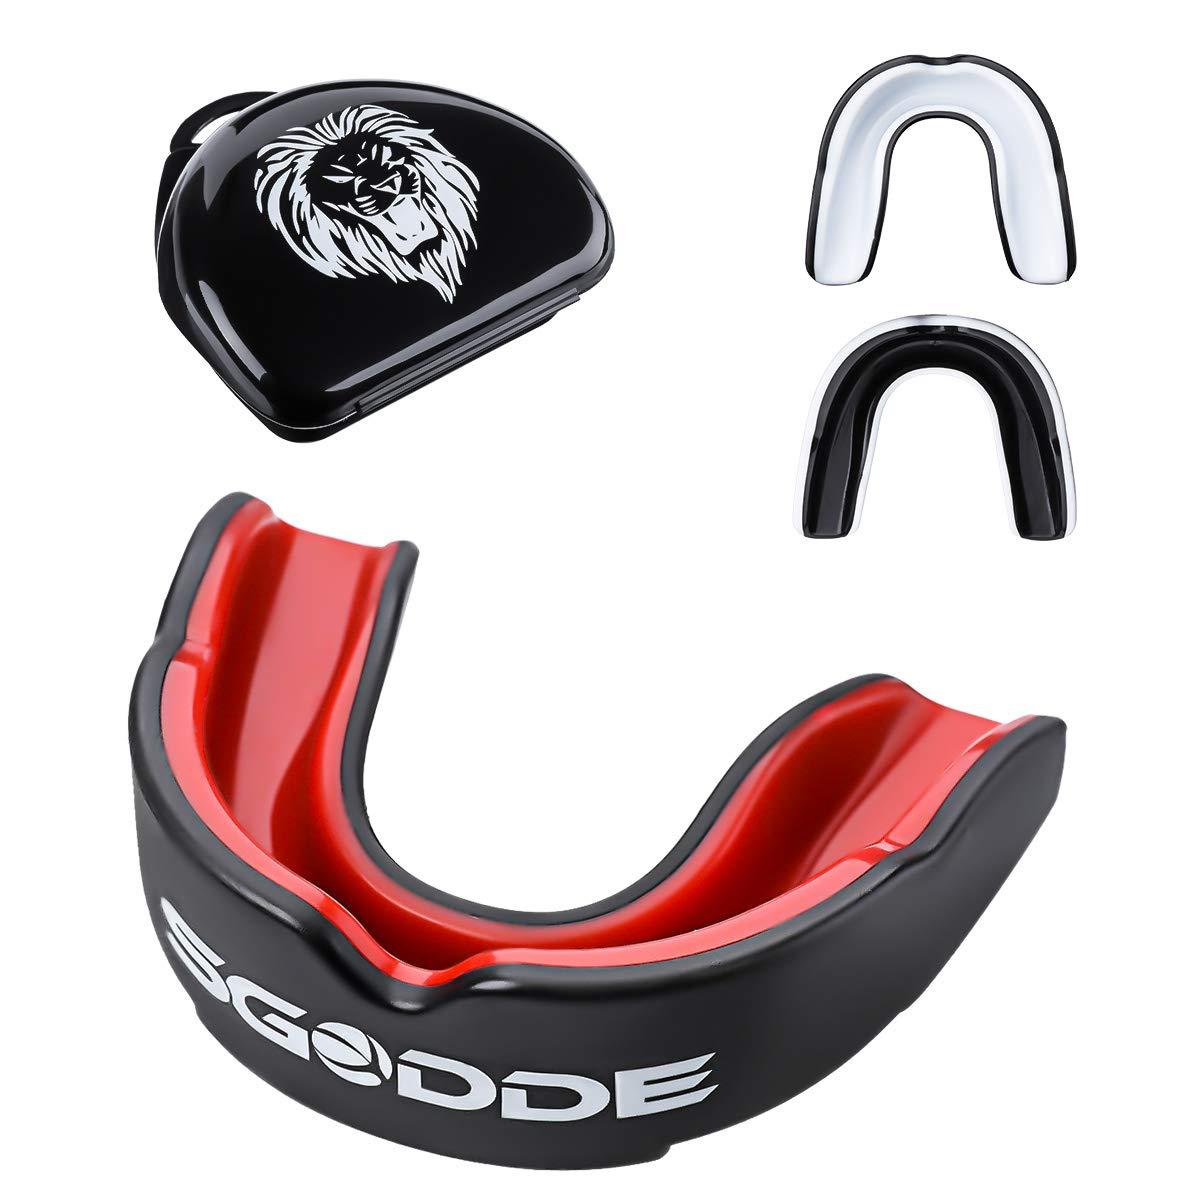 SGODDE Protector Bucal Boxeo, Deportivo Cubierta de Diente de Protección de Material EVA Adecuado para Boxeo, Taekwondo, Lucha Libre y Baloncesto etc.(Rojo)